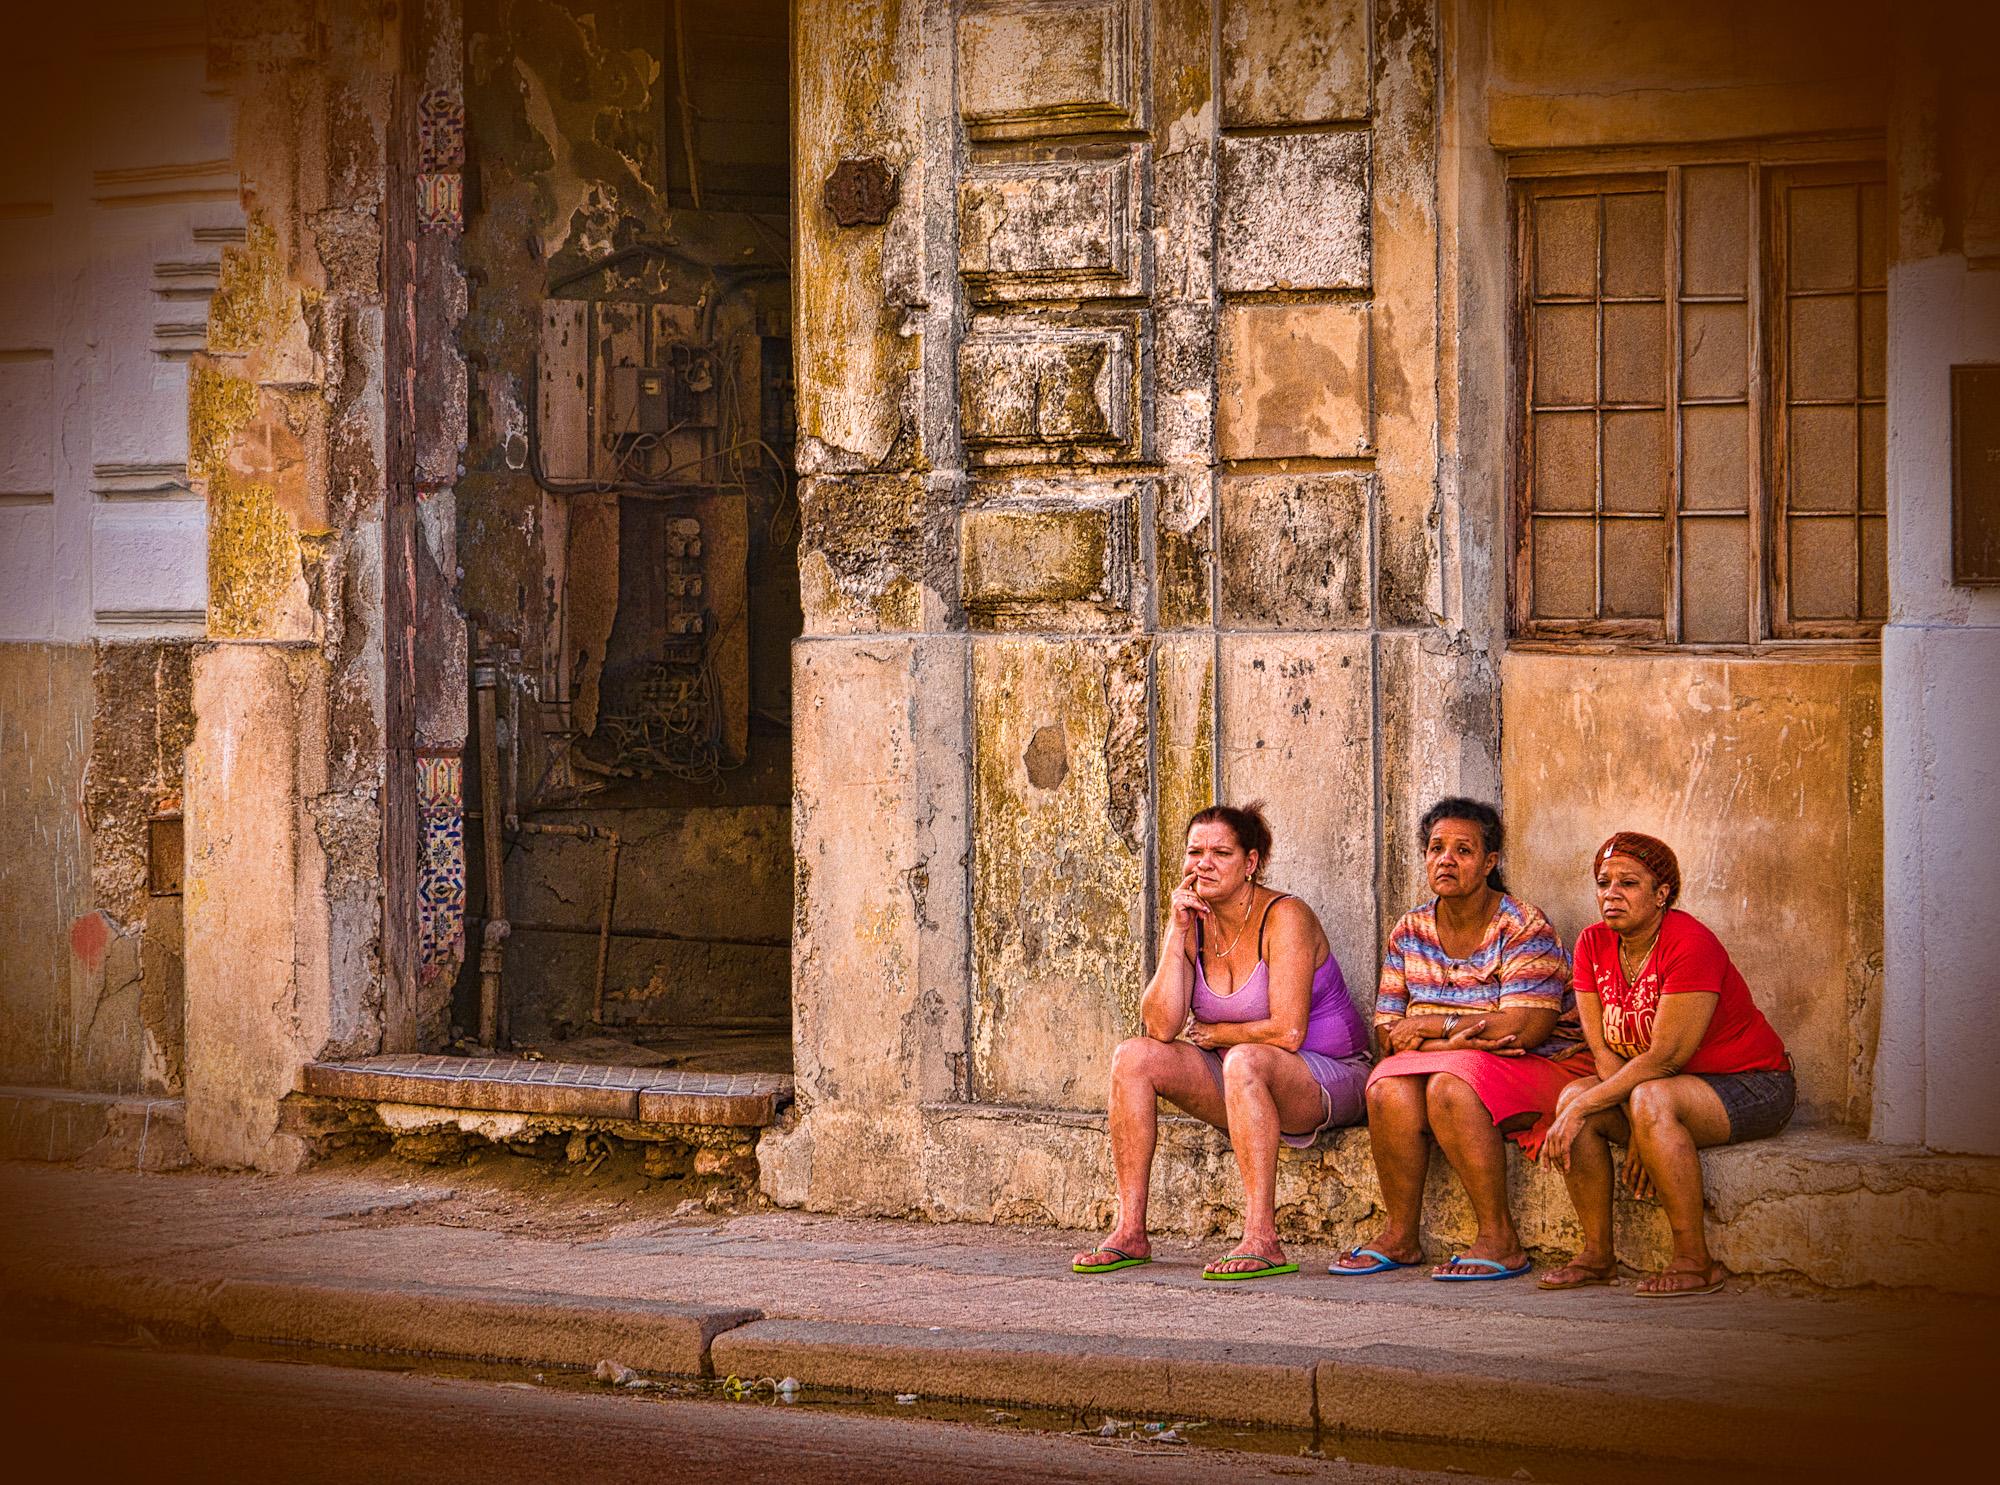 Bill_Barnett_Cuban Women on Street.jpg